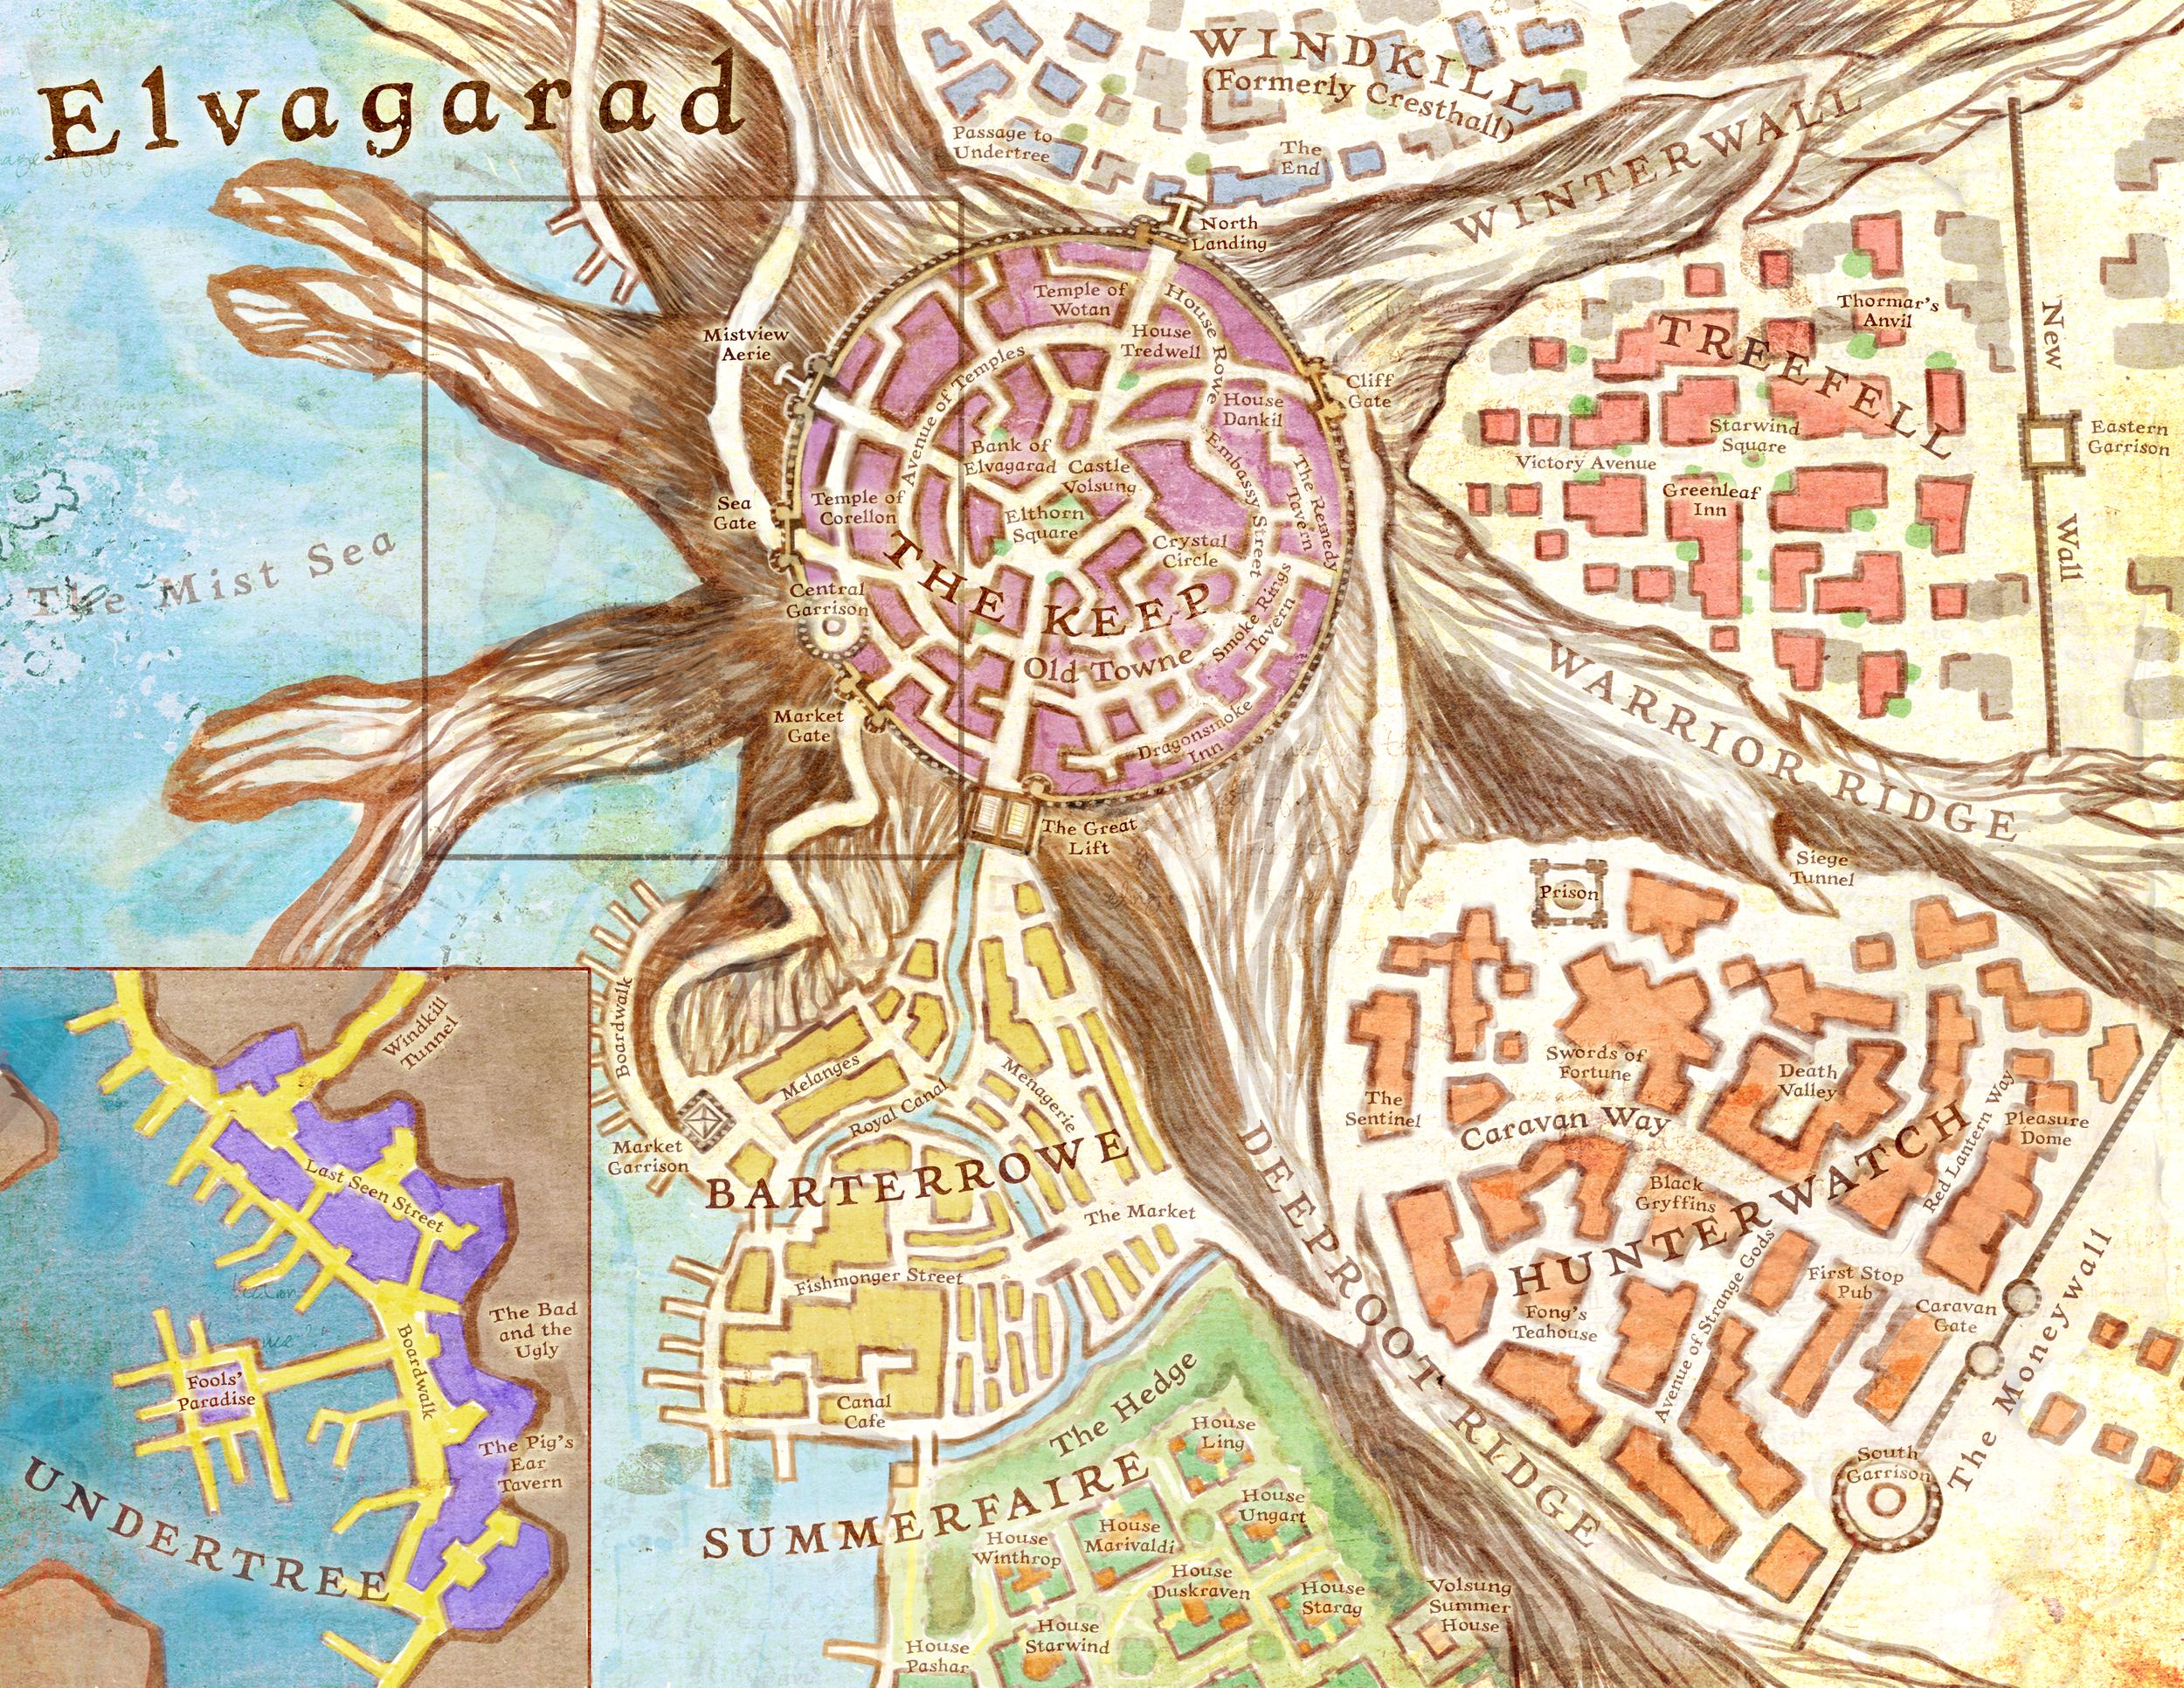 The City of Elvagarad.